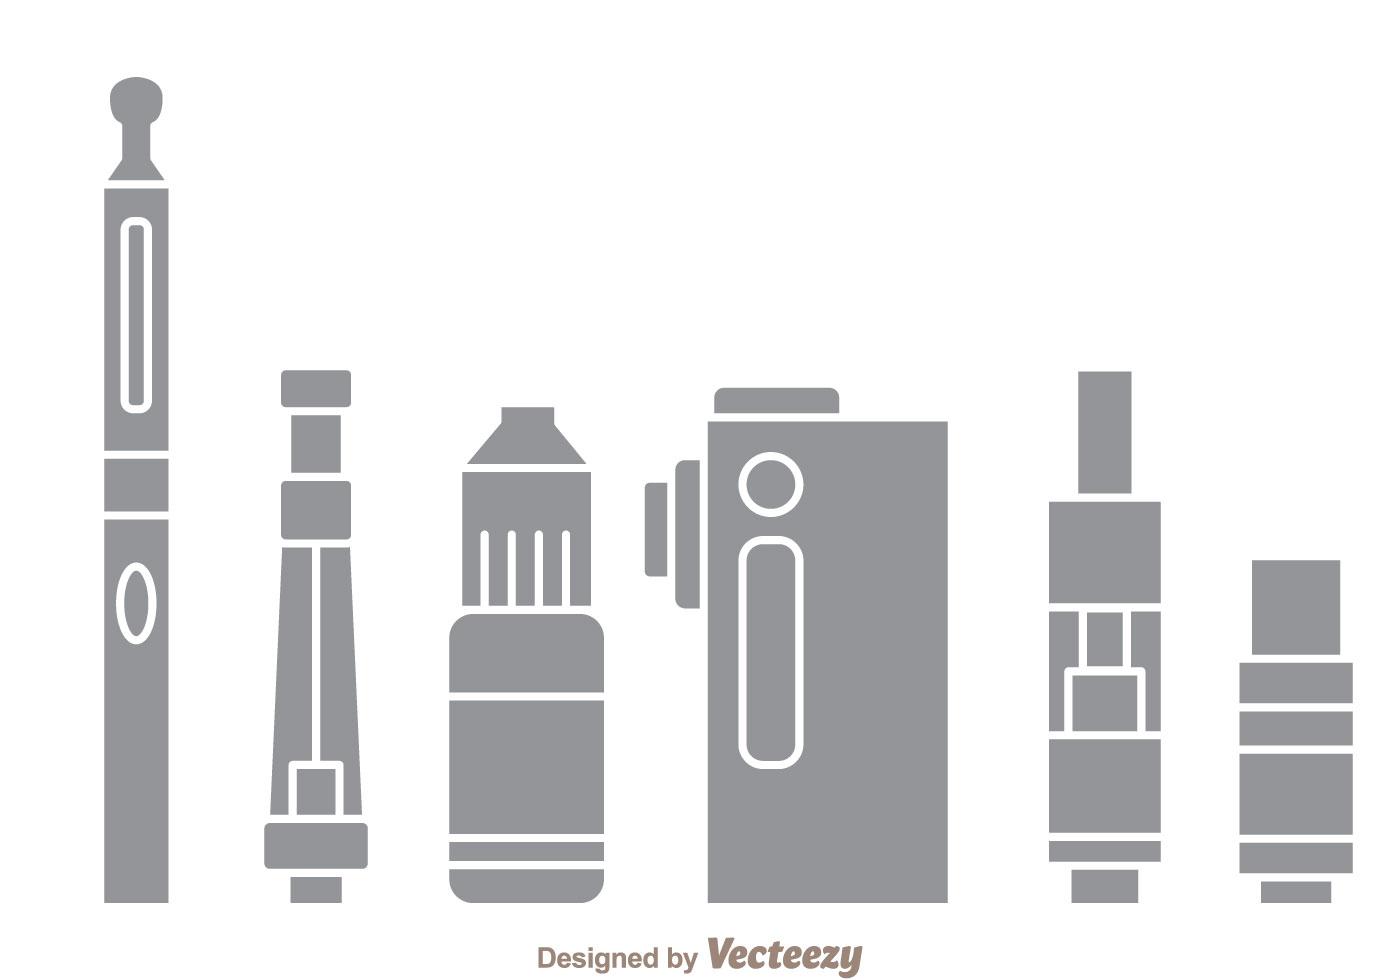 vape gray icons download free vector art stock graphics